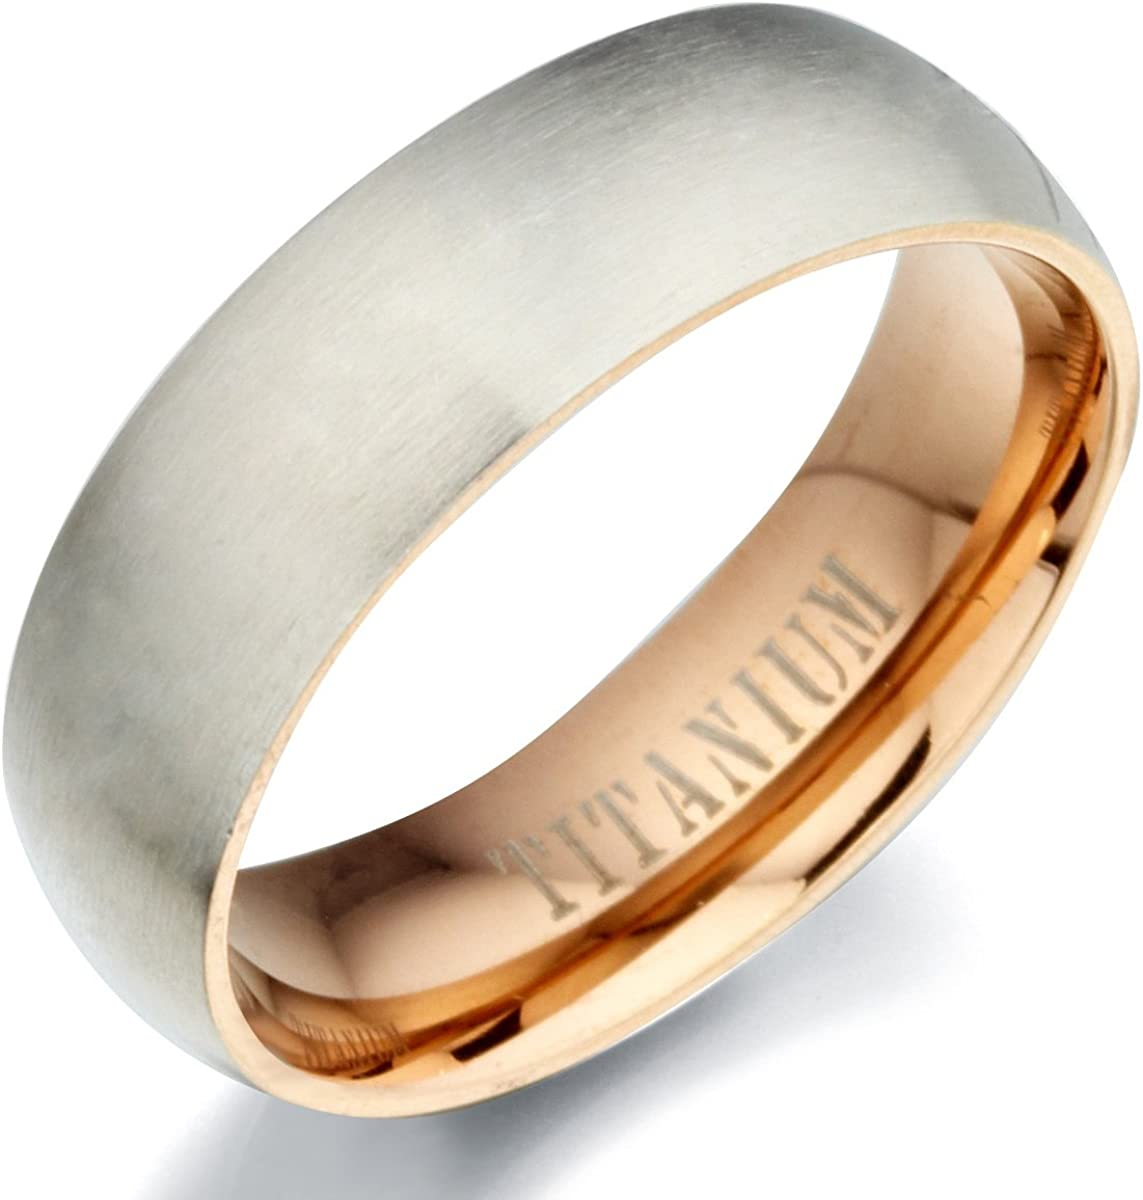 Gemini His or Her Two Tone Black Matt and Polish Titanium Wedding Ring Width 5mm